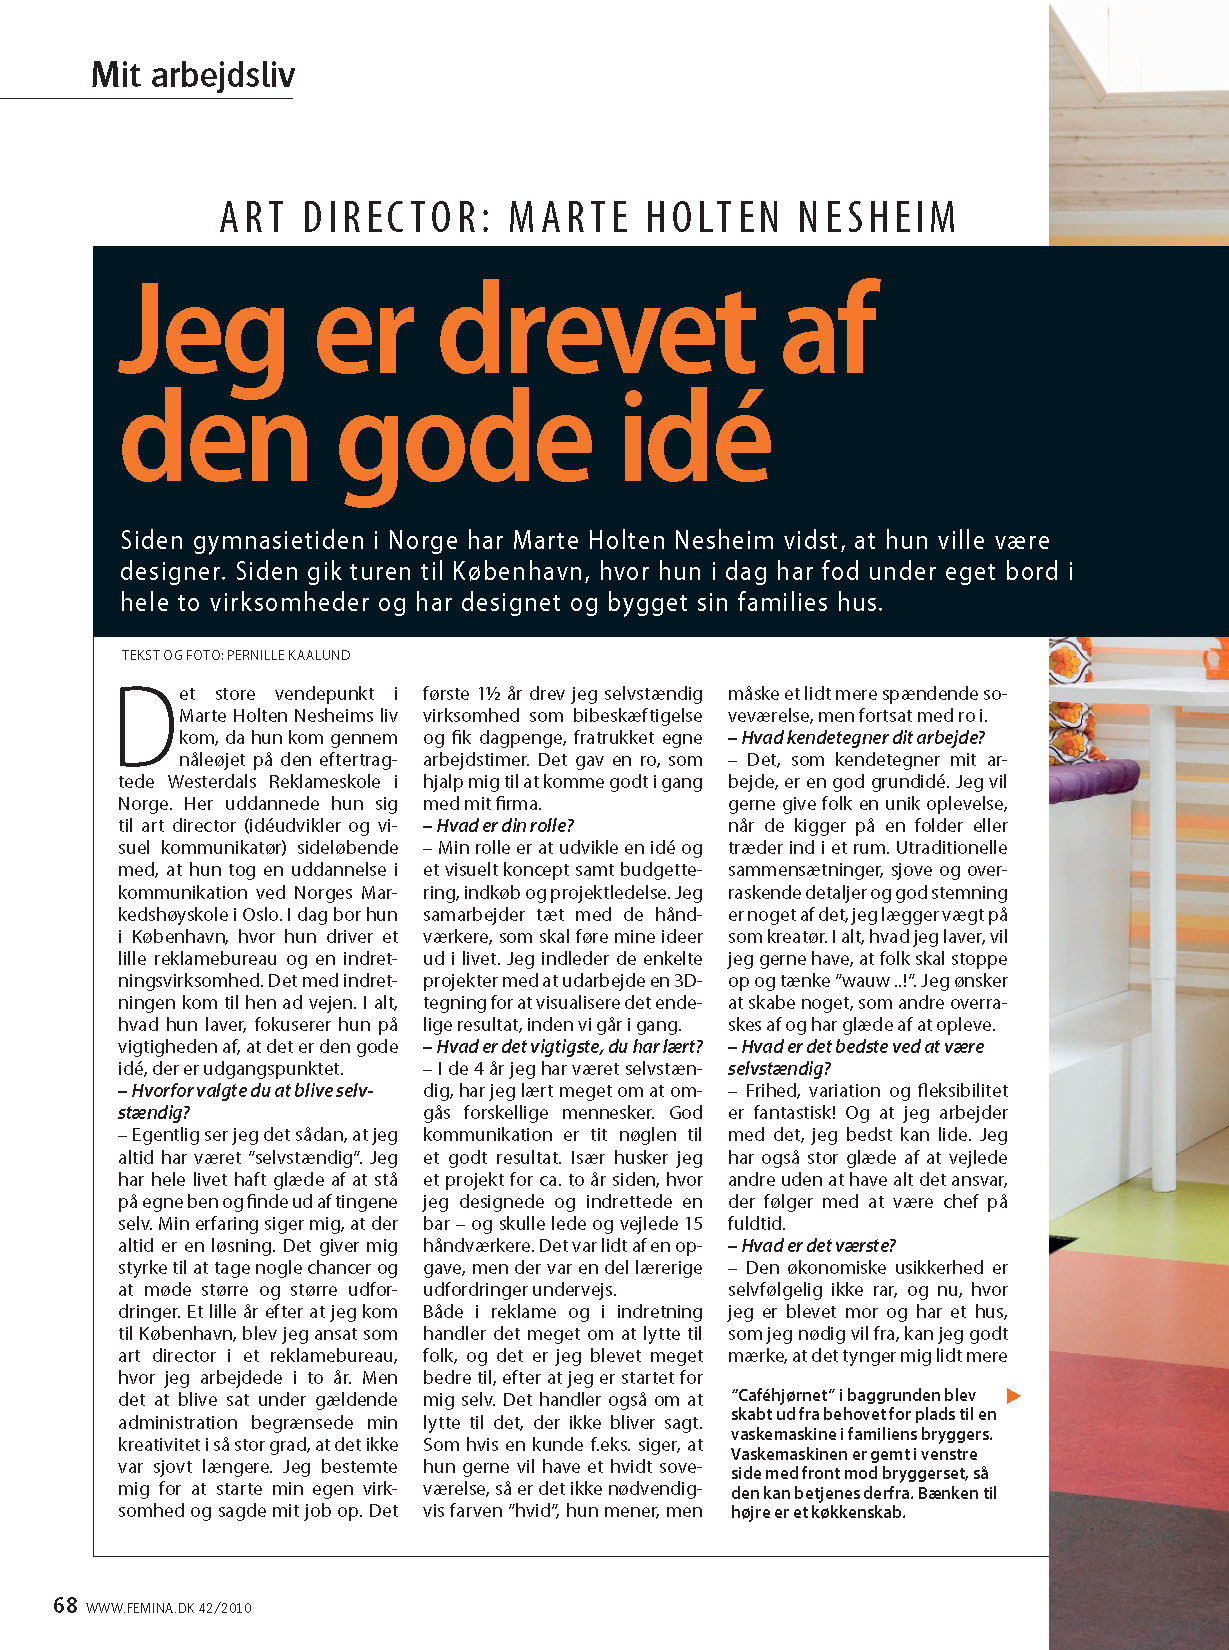 Femina artikkel Page_1